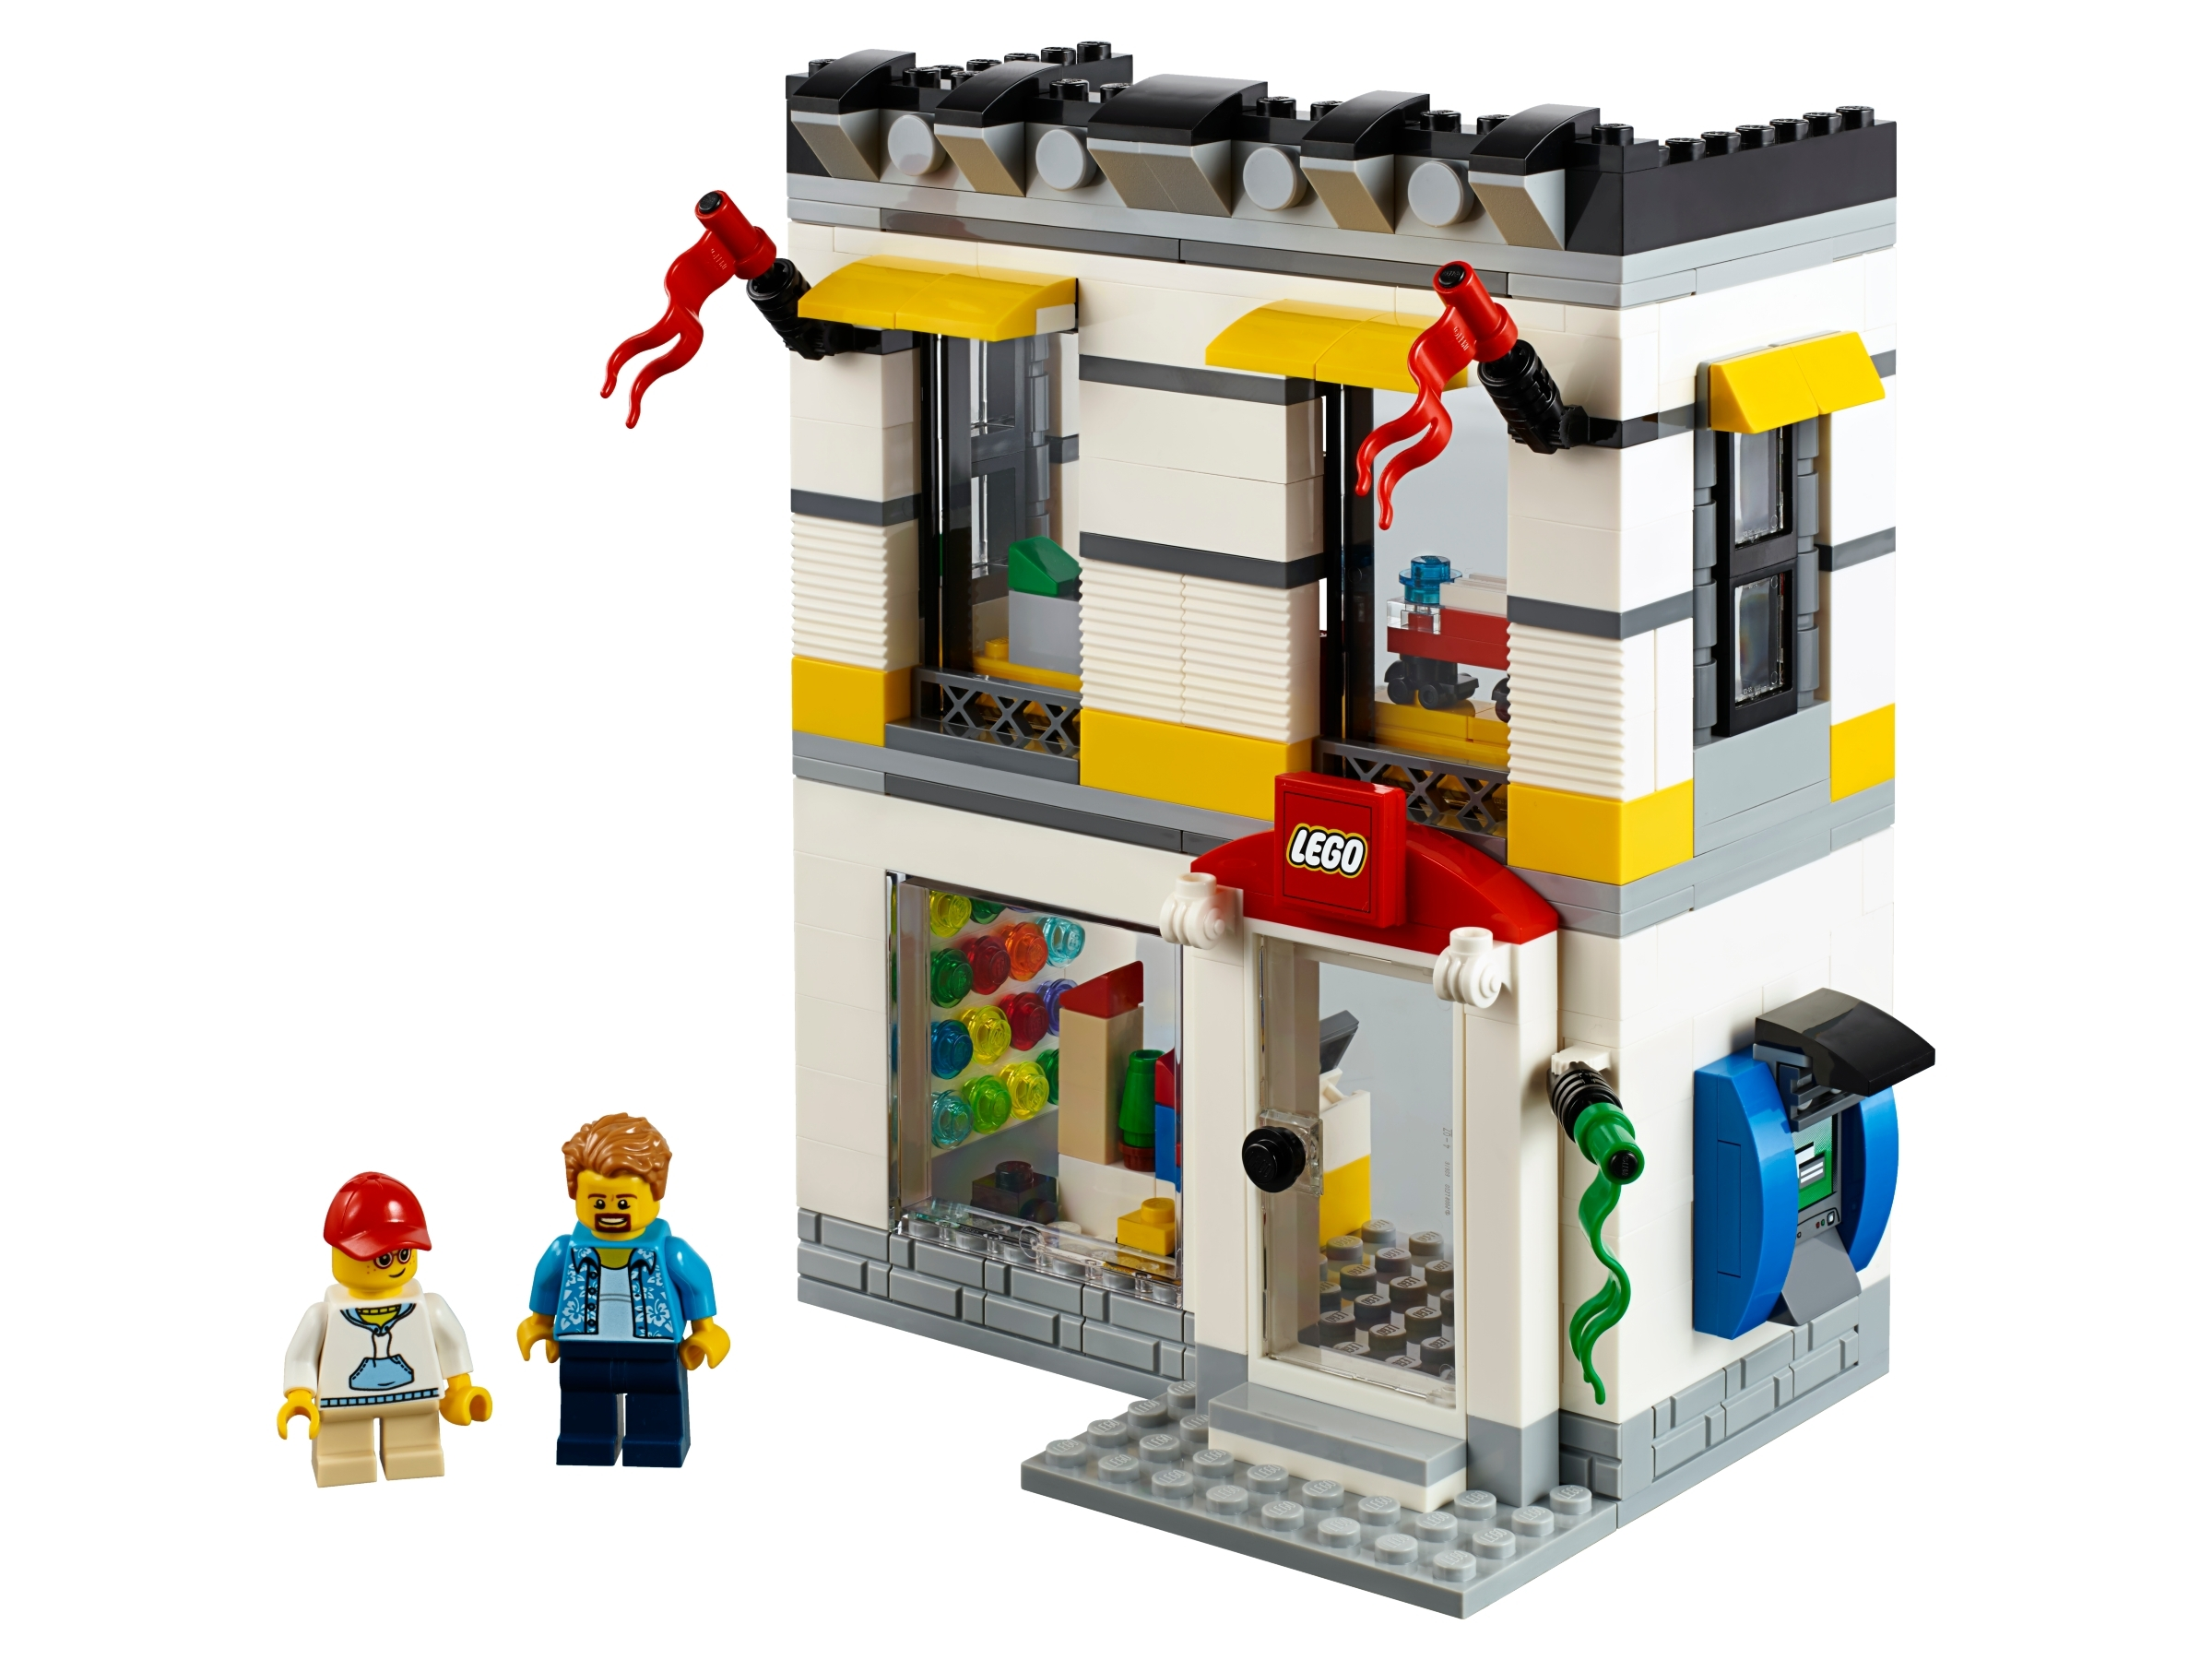 LEGO 40305 MICROSCALE LEGO BRAND STORE BOX SET *FLAGSHIP EXCLUSIVE*